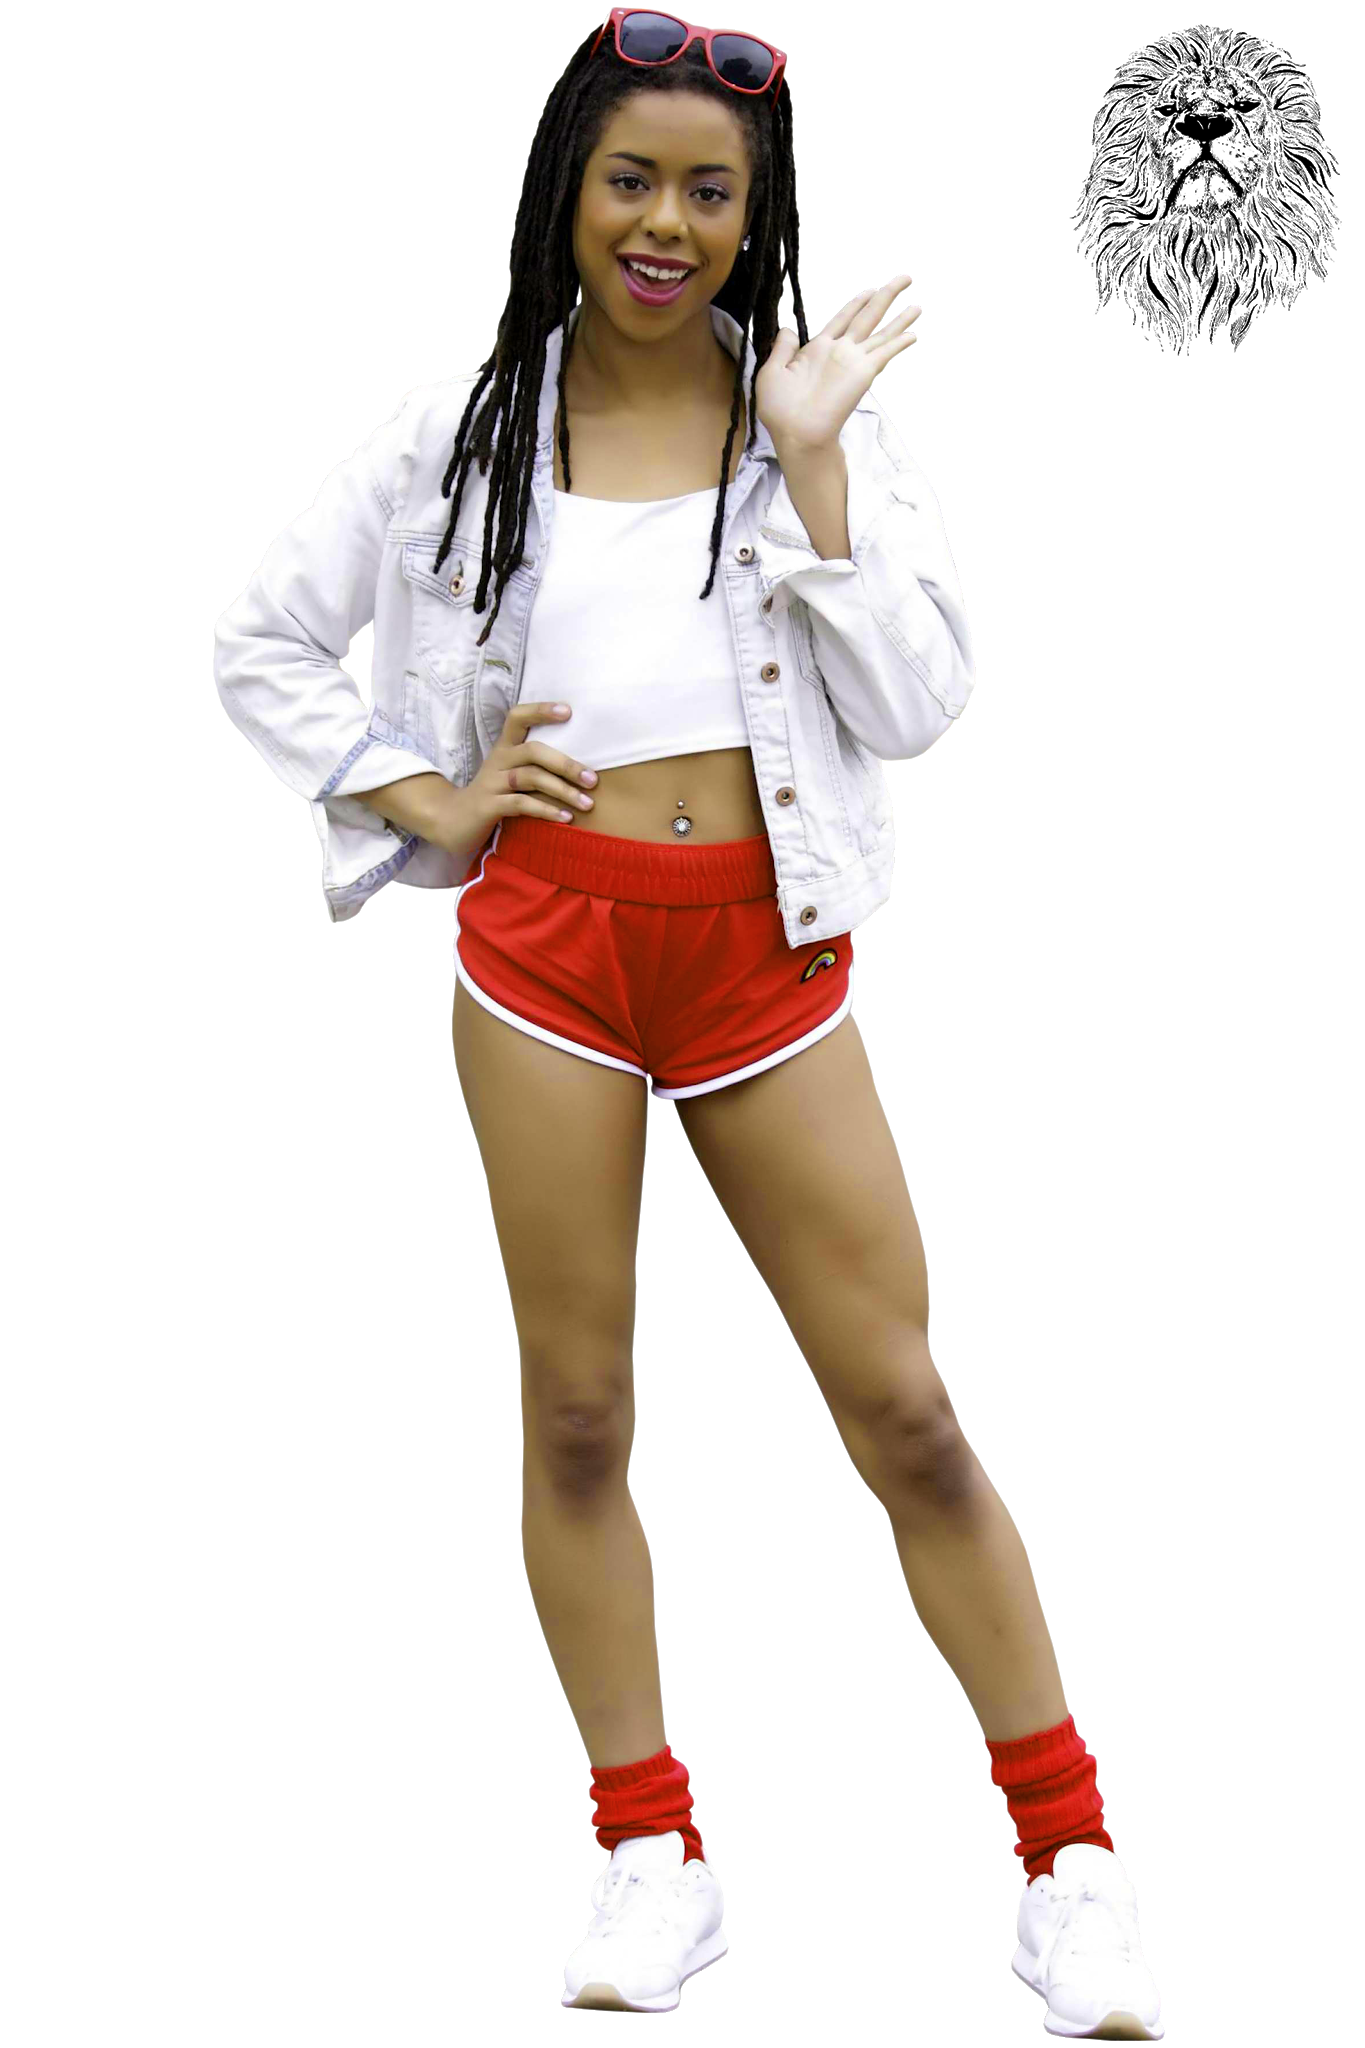 Models - Kira Noir - Digital Playground (2)